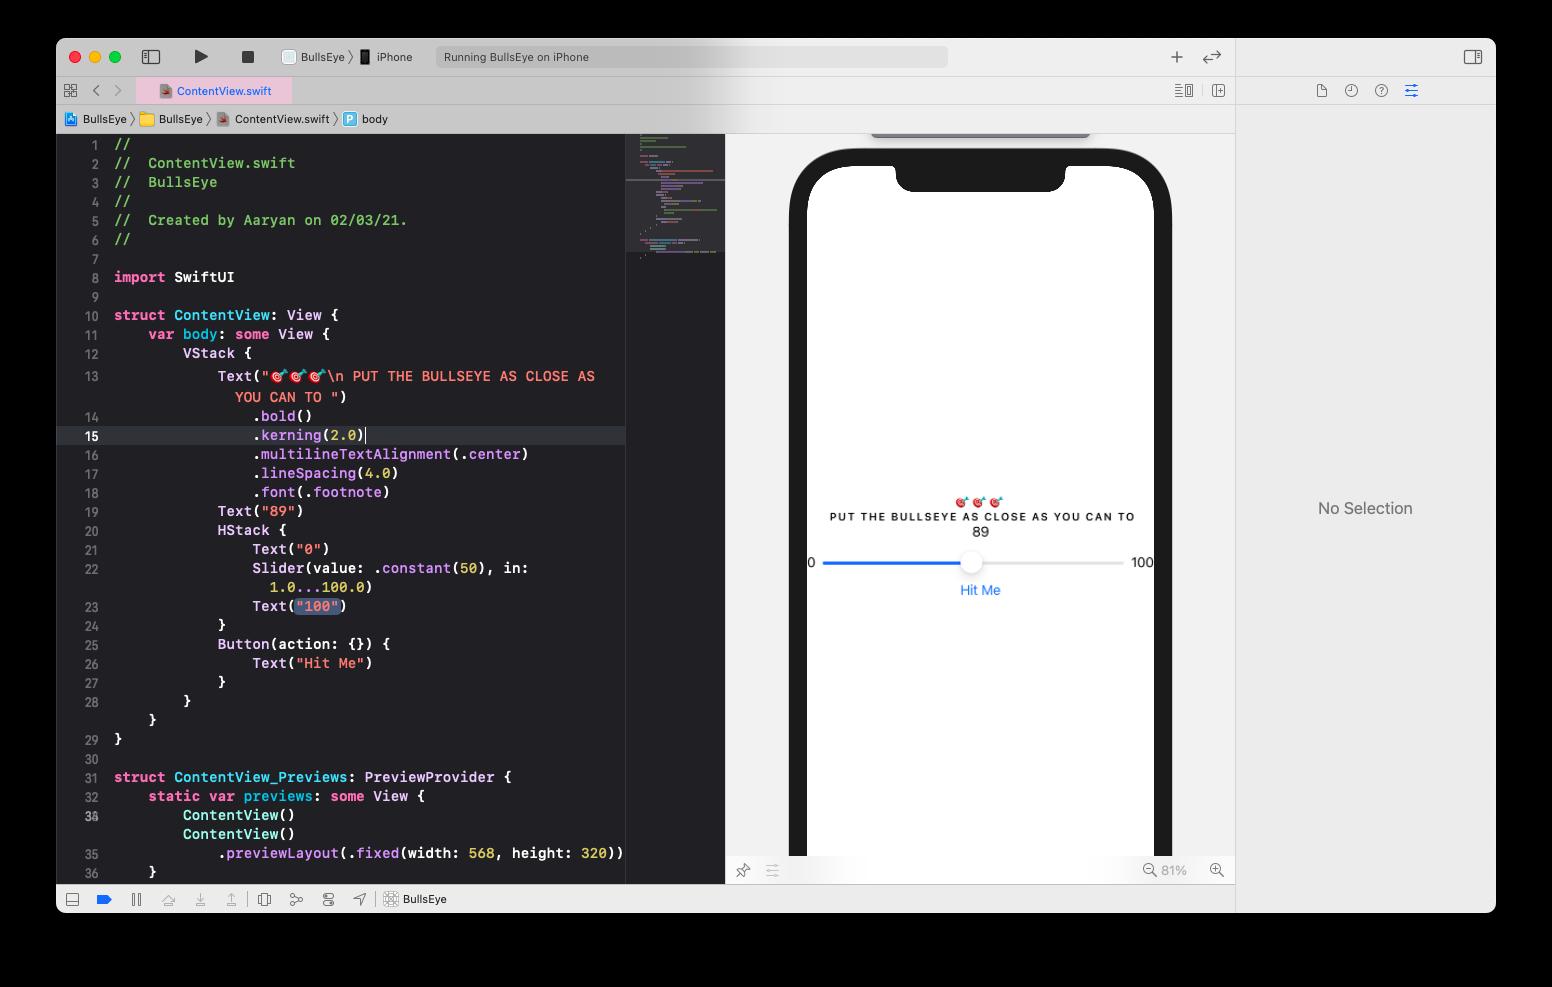 https://cloud-pnv5wf2tn-hack-club-bot.vercel.app/0screenshot_2021-03-02_at_9.20.57_pm.png